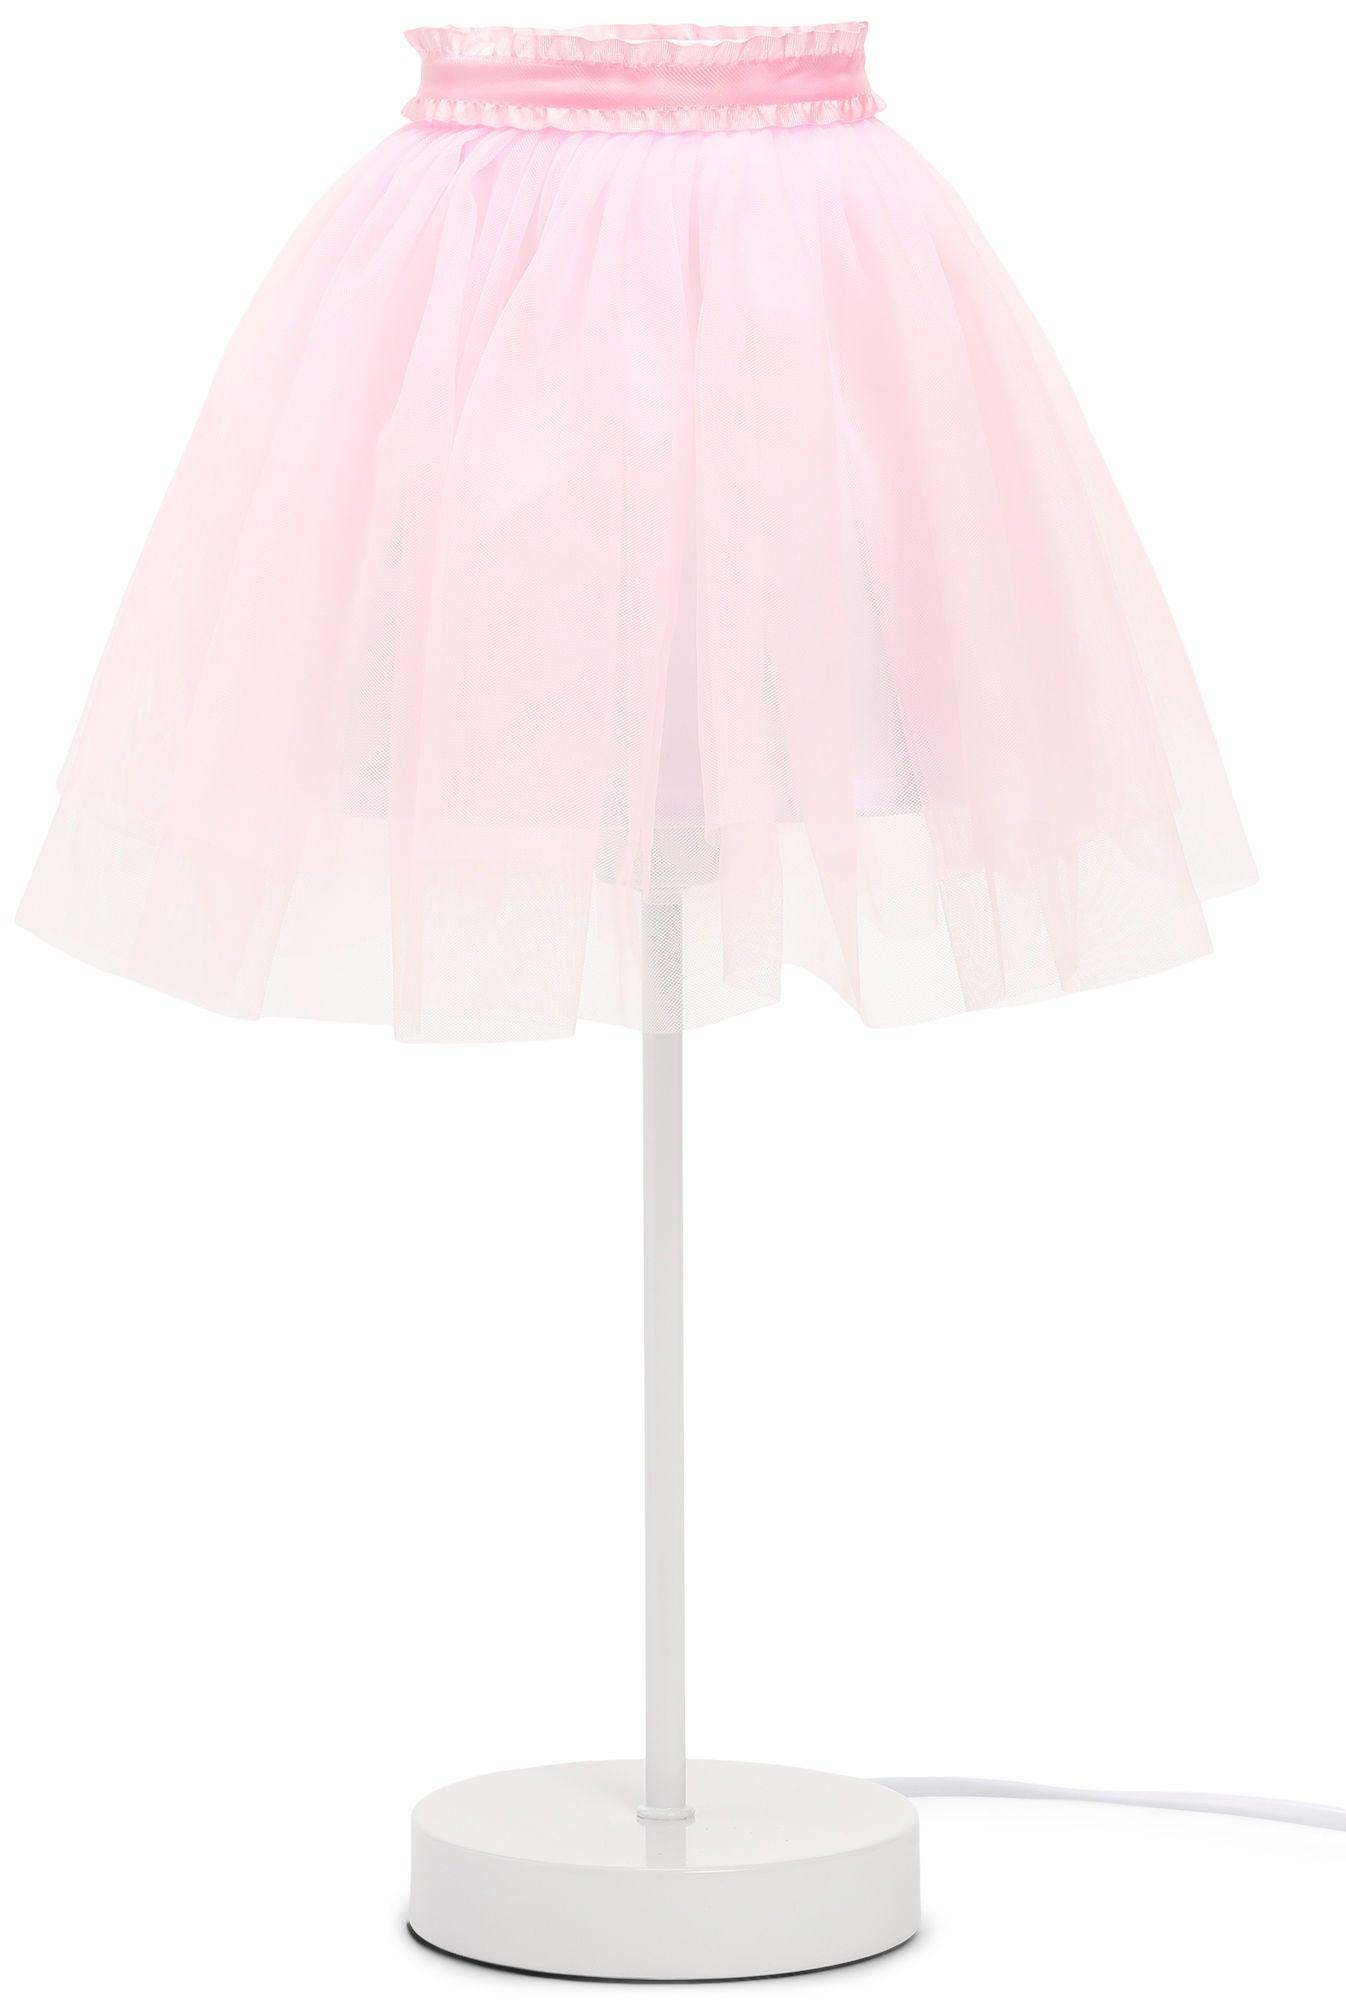 Alice & Fox Pöytävalaisin Princess, Pink